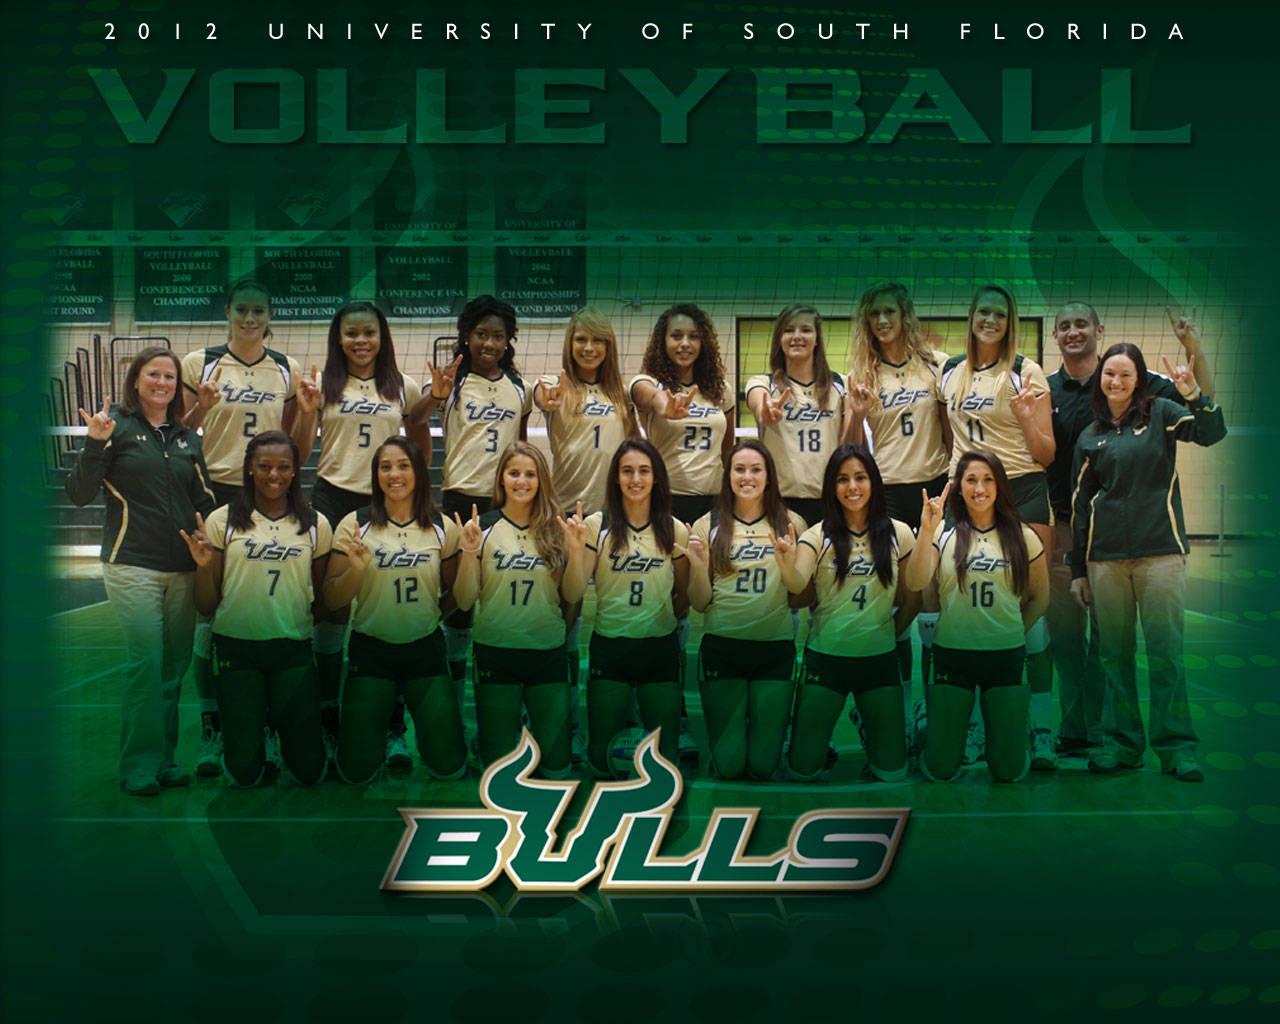 Usf Bulls Logo Wallpaper 2012 13 wallpapers 1280x1024